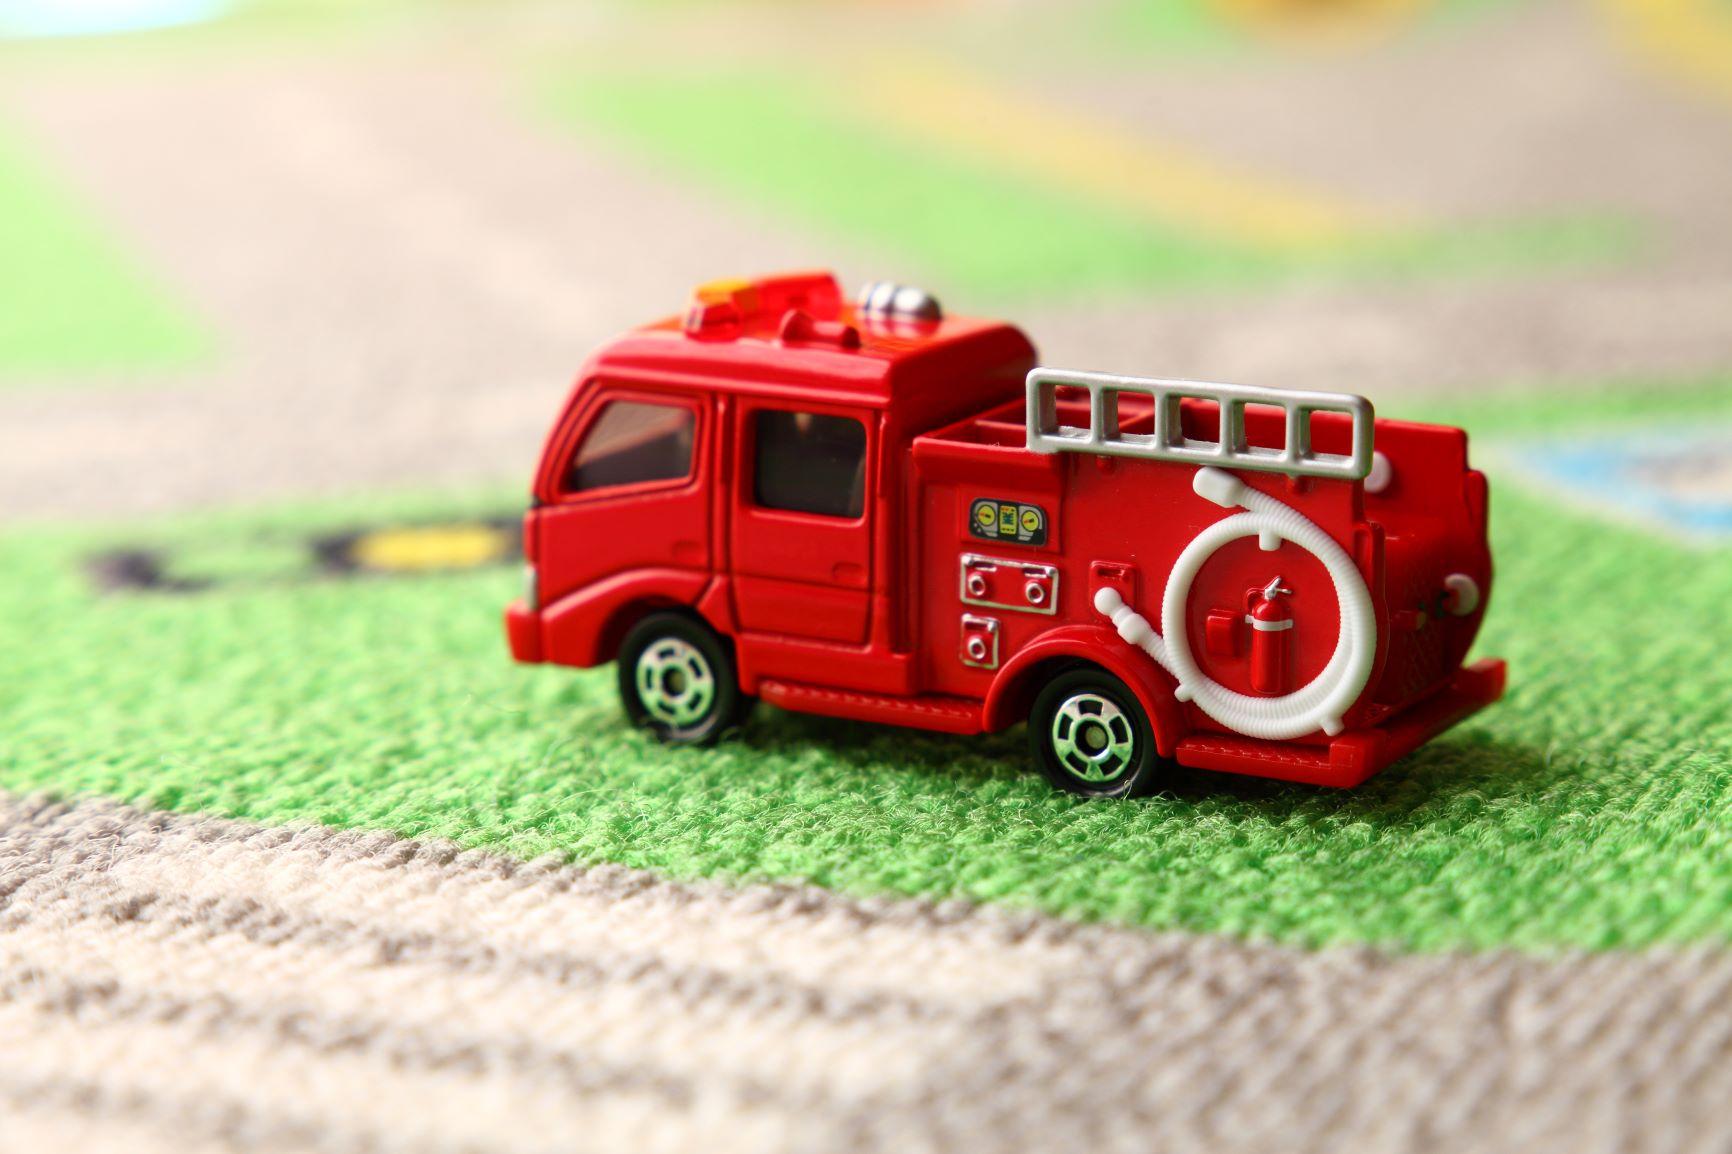 団員検索や報酬・費用弁償計算に対応!消防団員情報を簡単管理